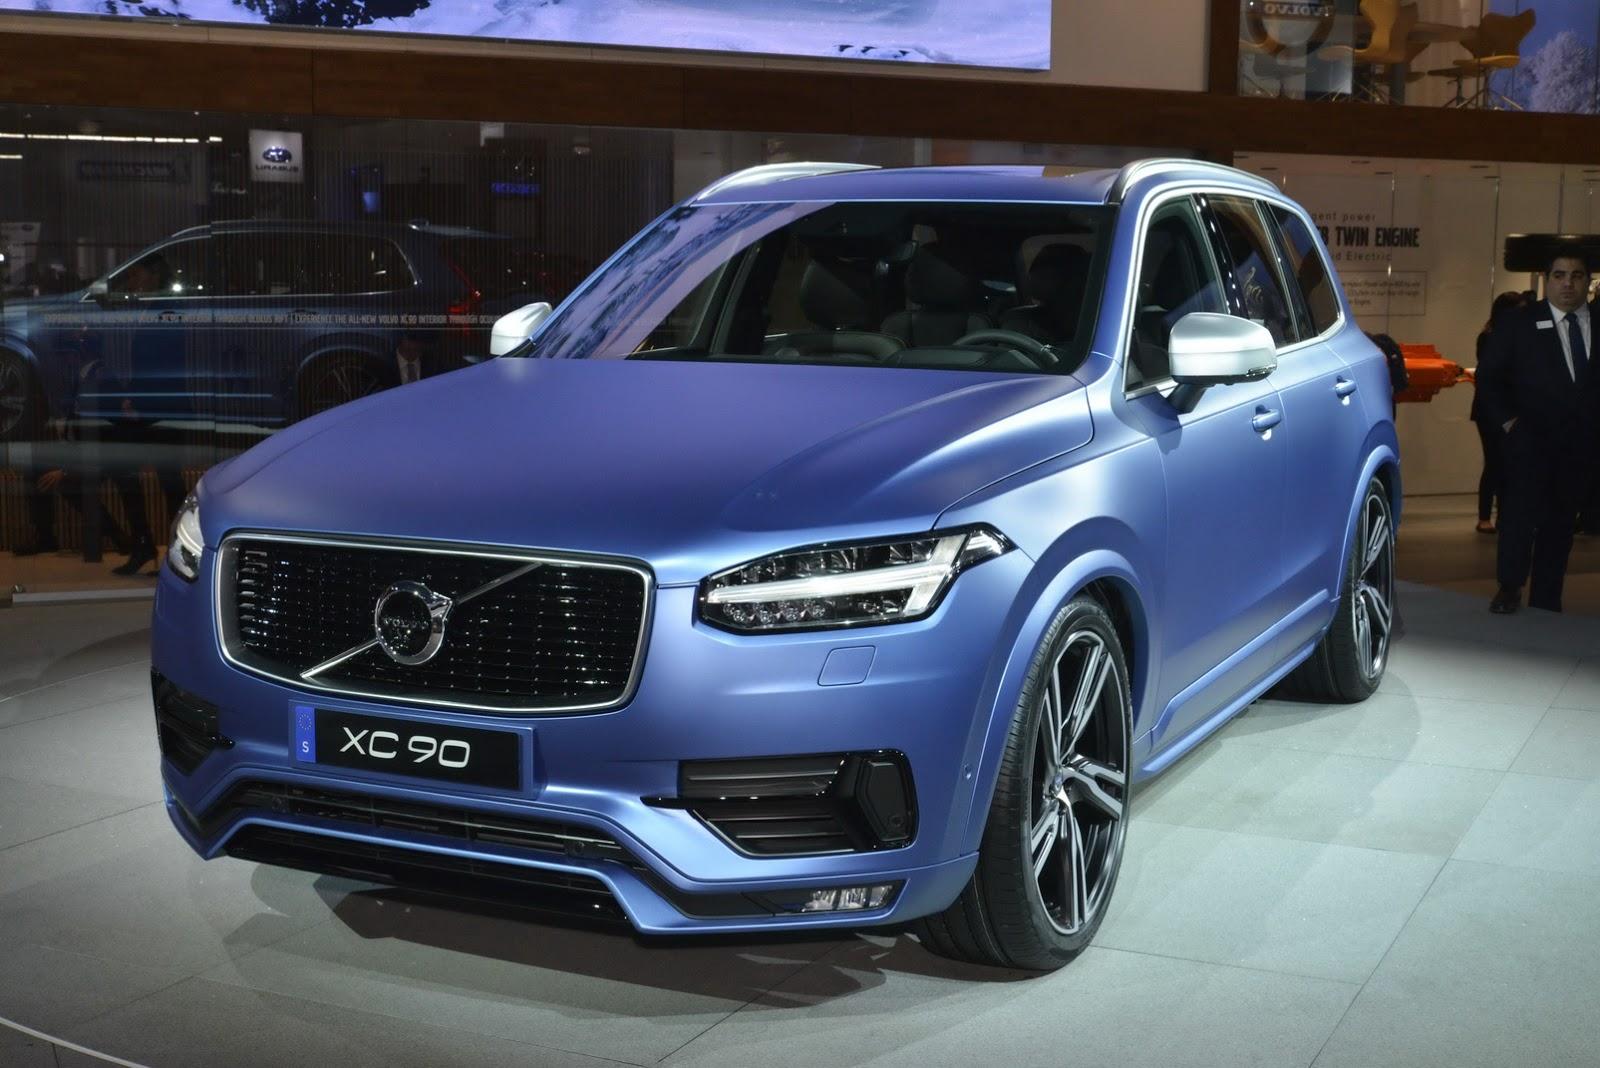 Volvo North America Volvo39s 2016 Xc90 R Design Makes North American Debut In A Cool